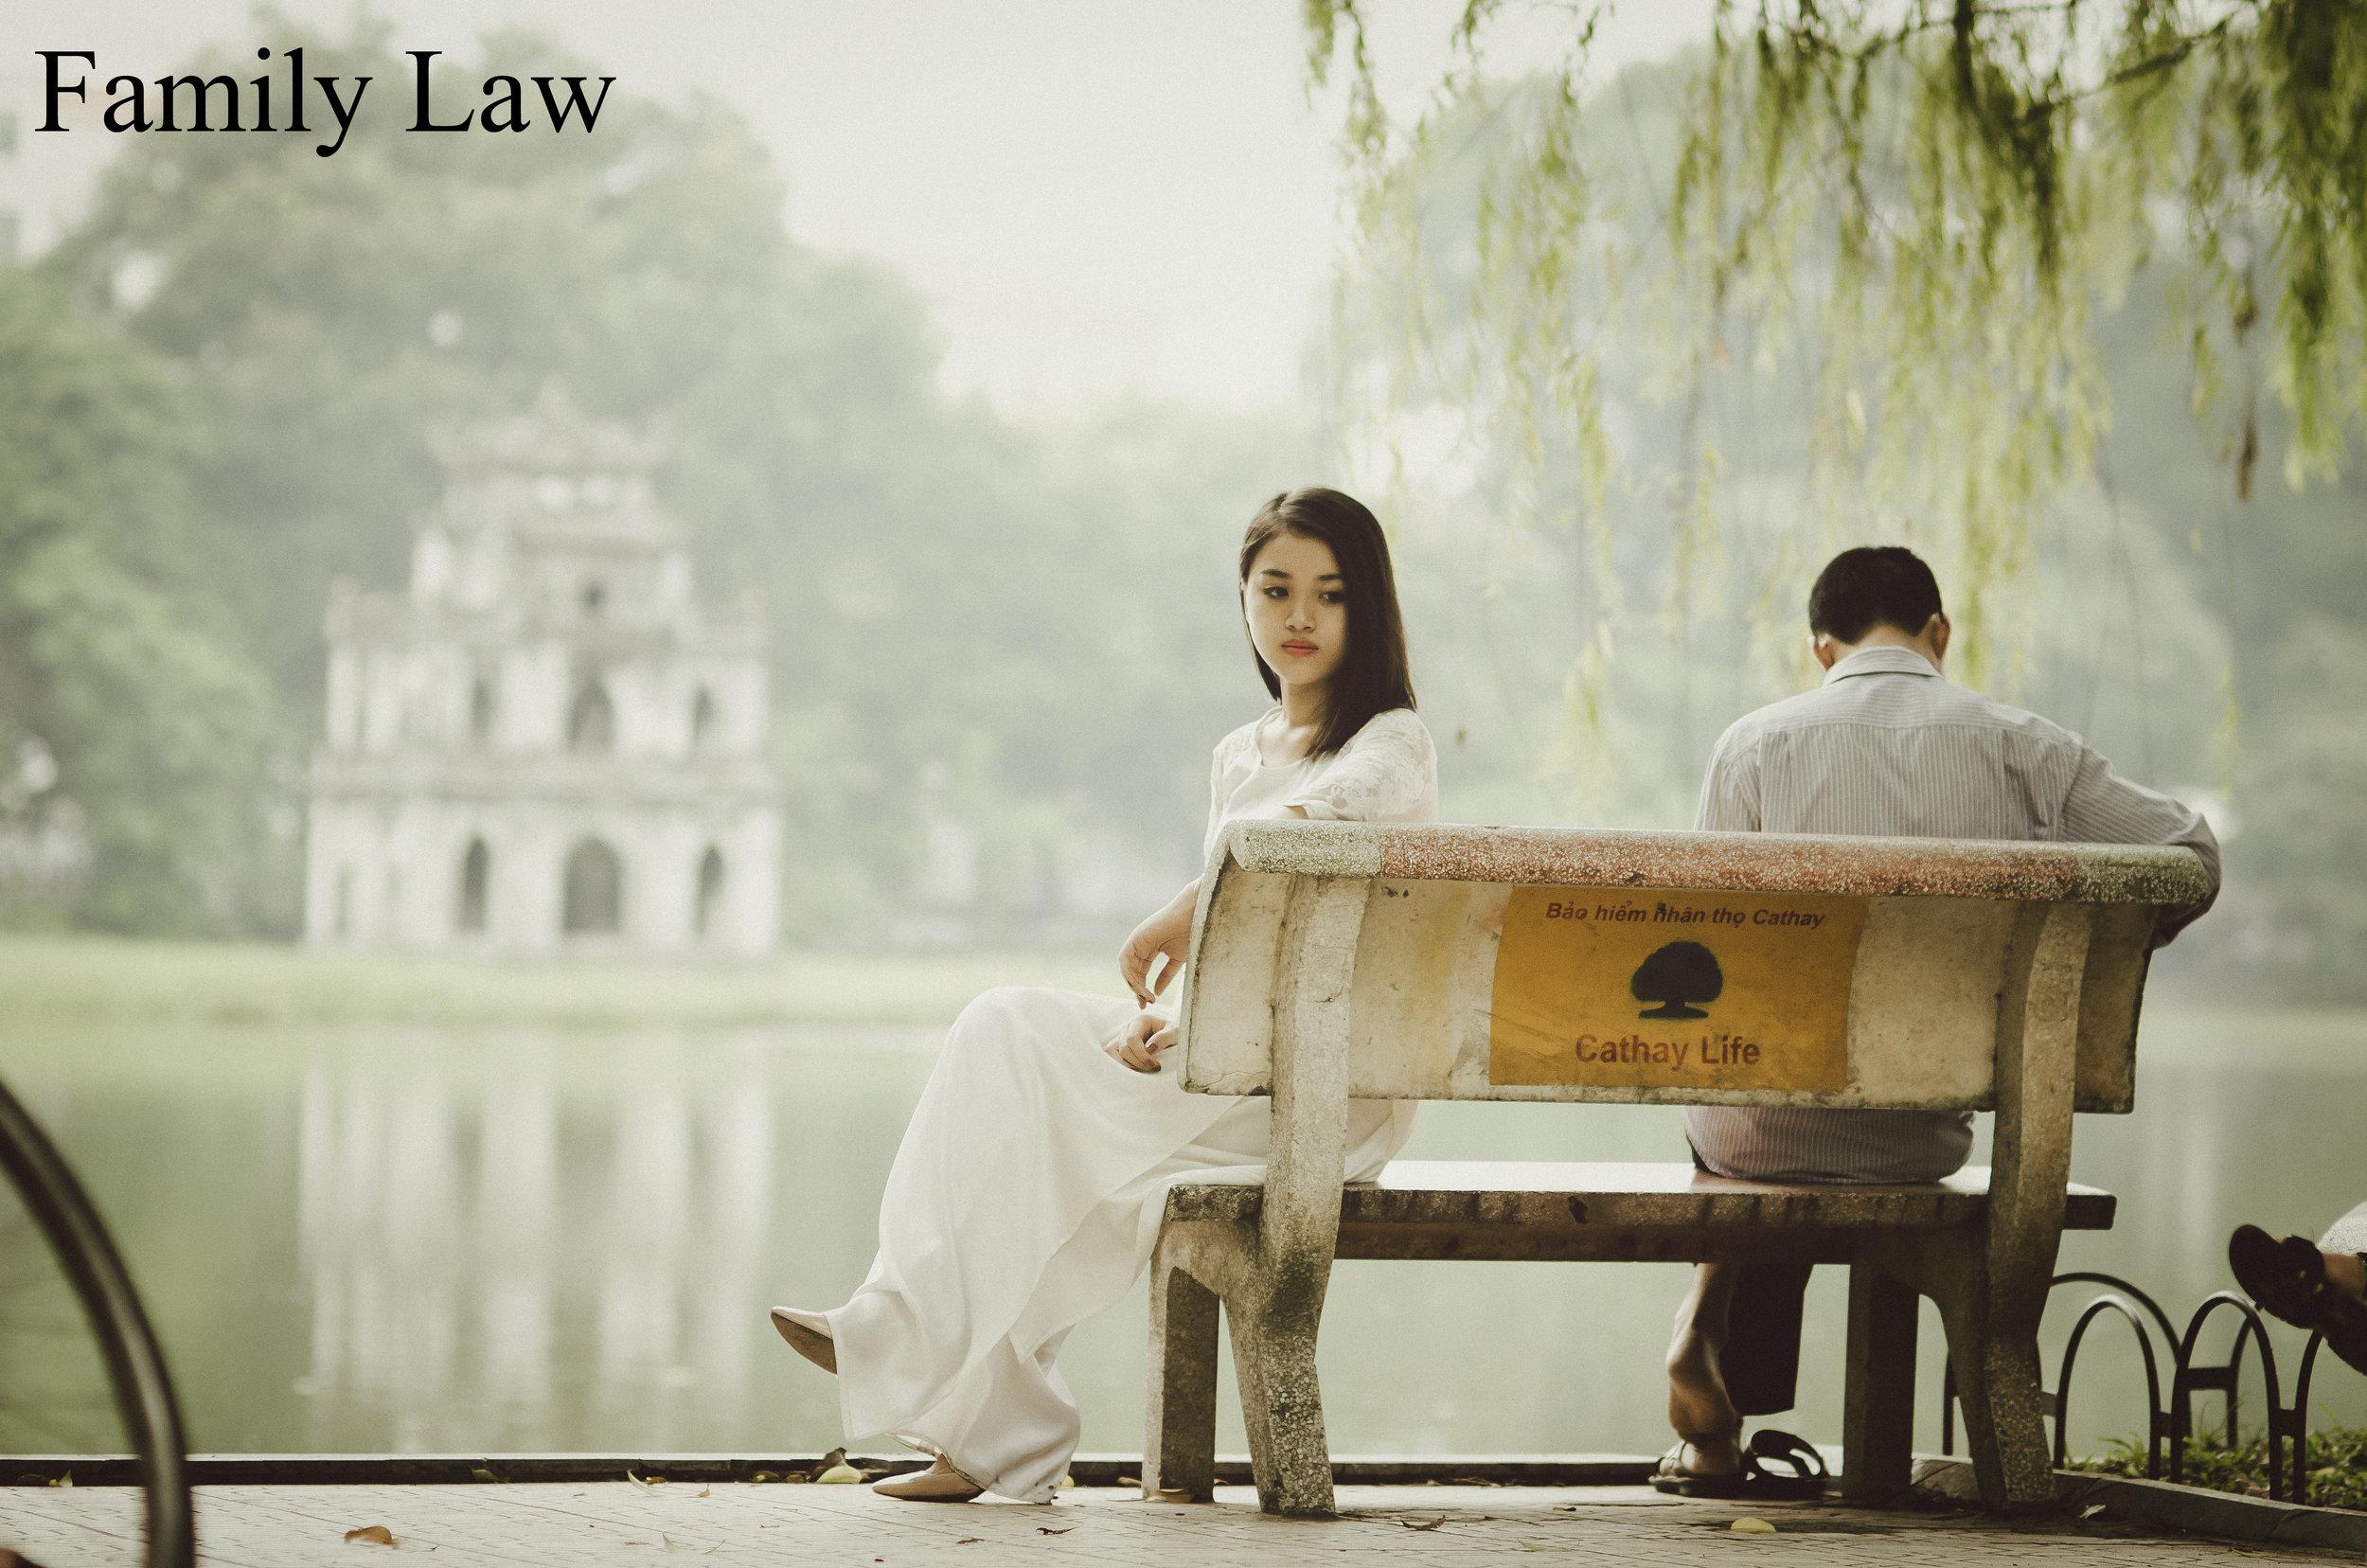 Family Law copy.jpg